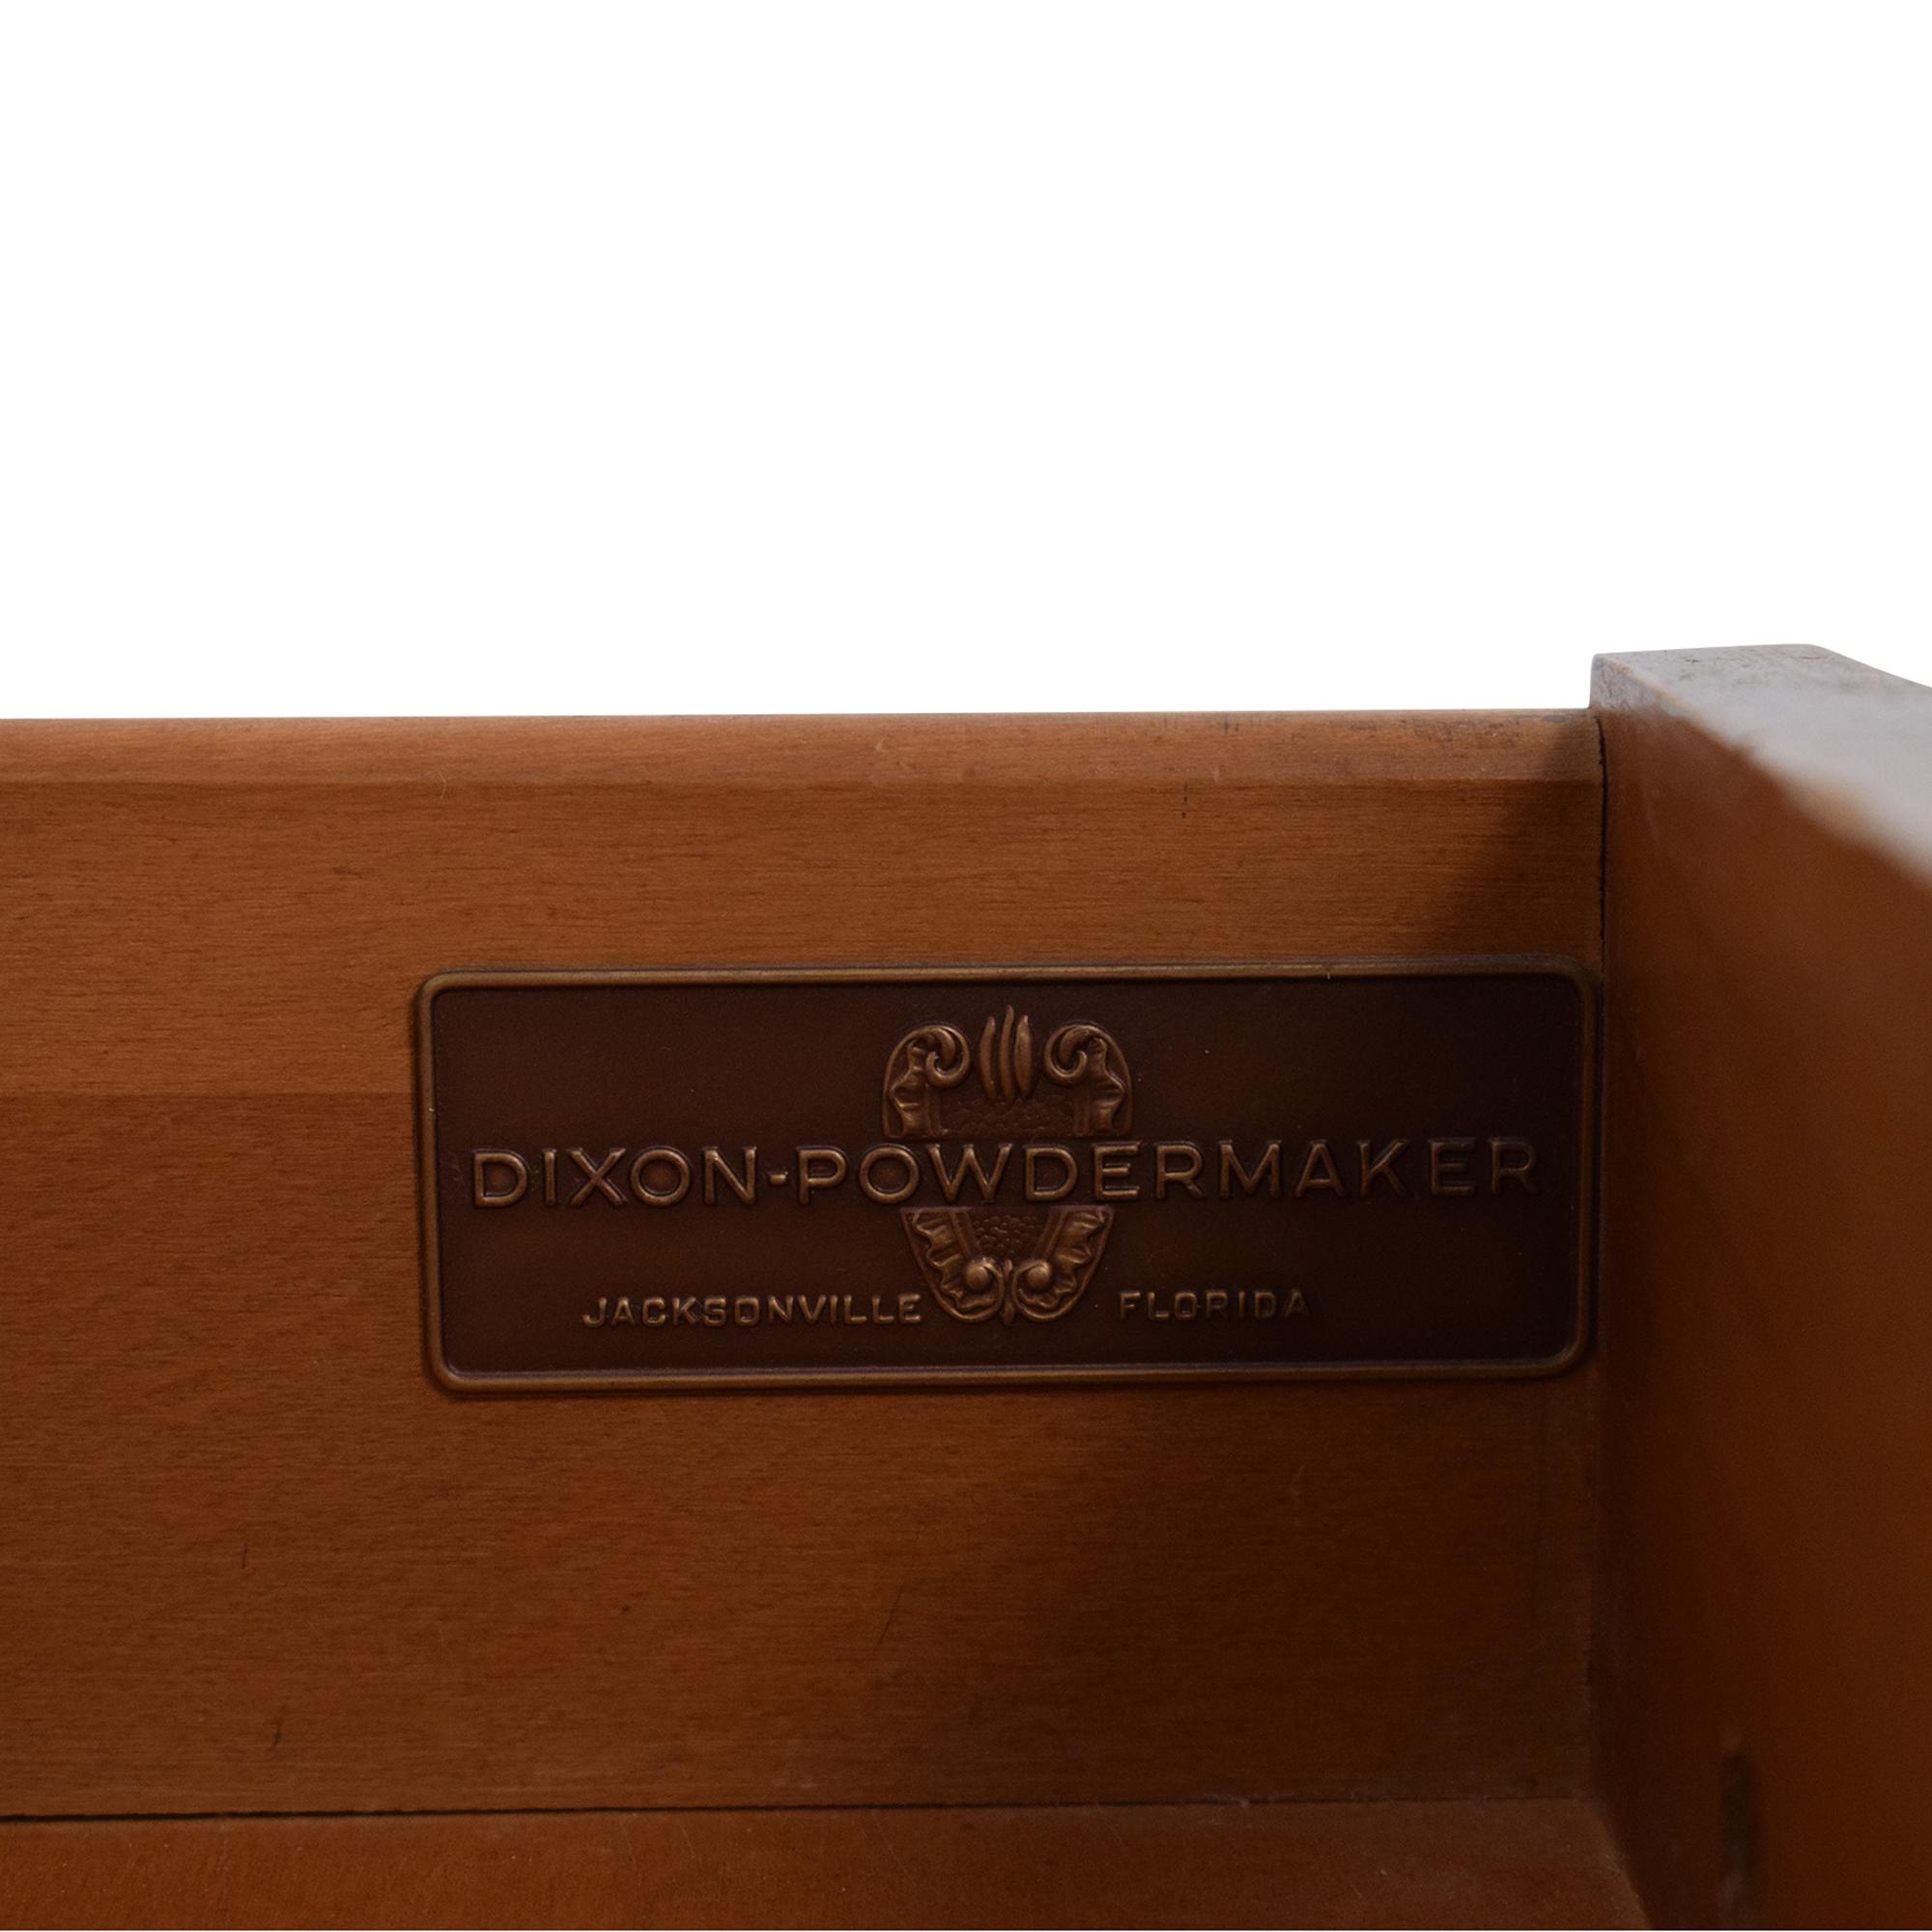 Dixon Powdermaker Dixon Powdermaker Nightstand for sale